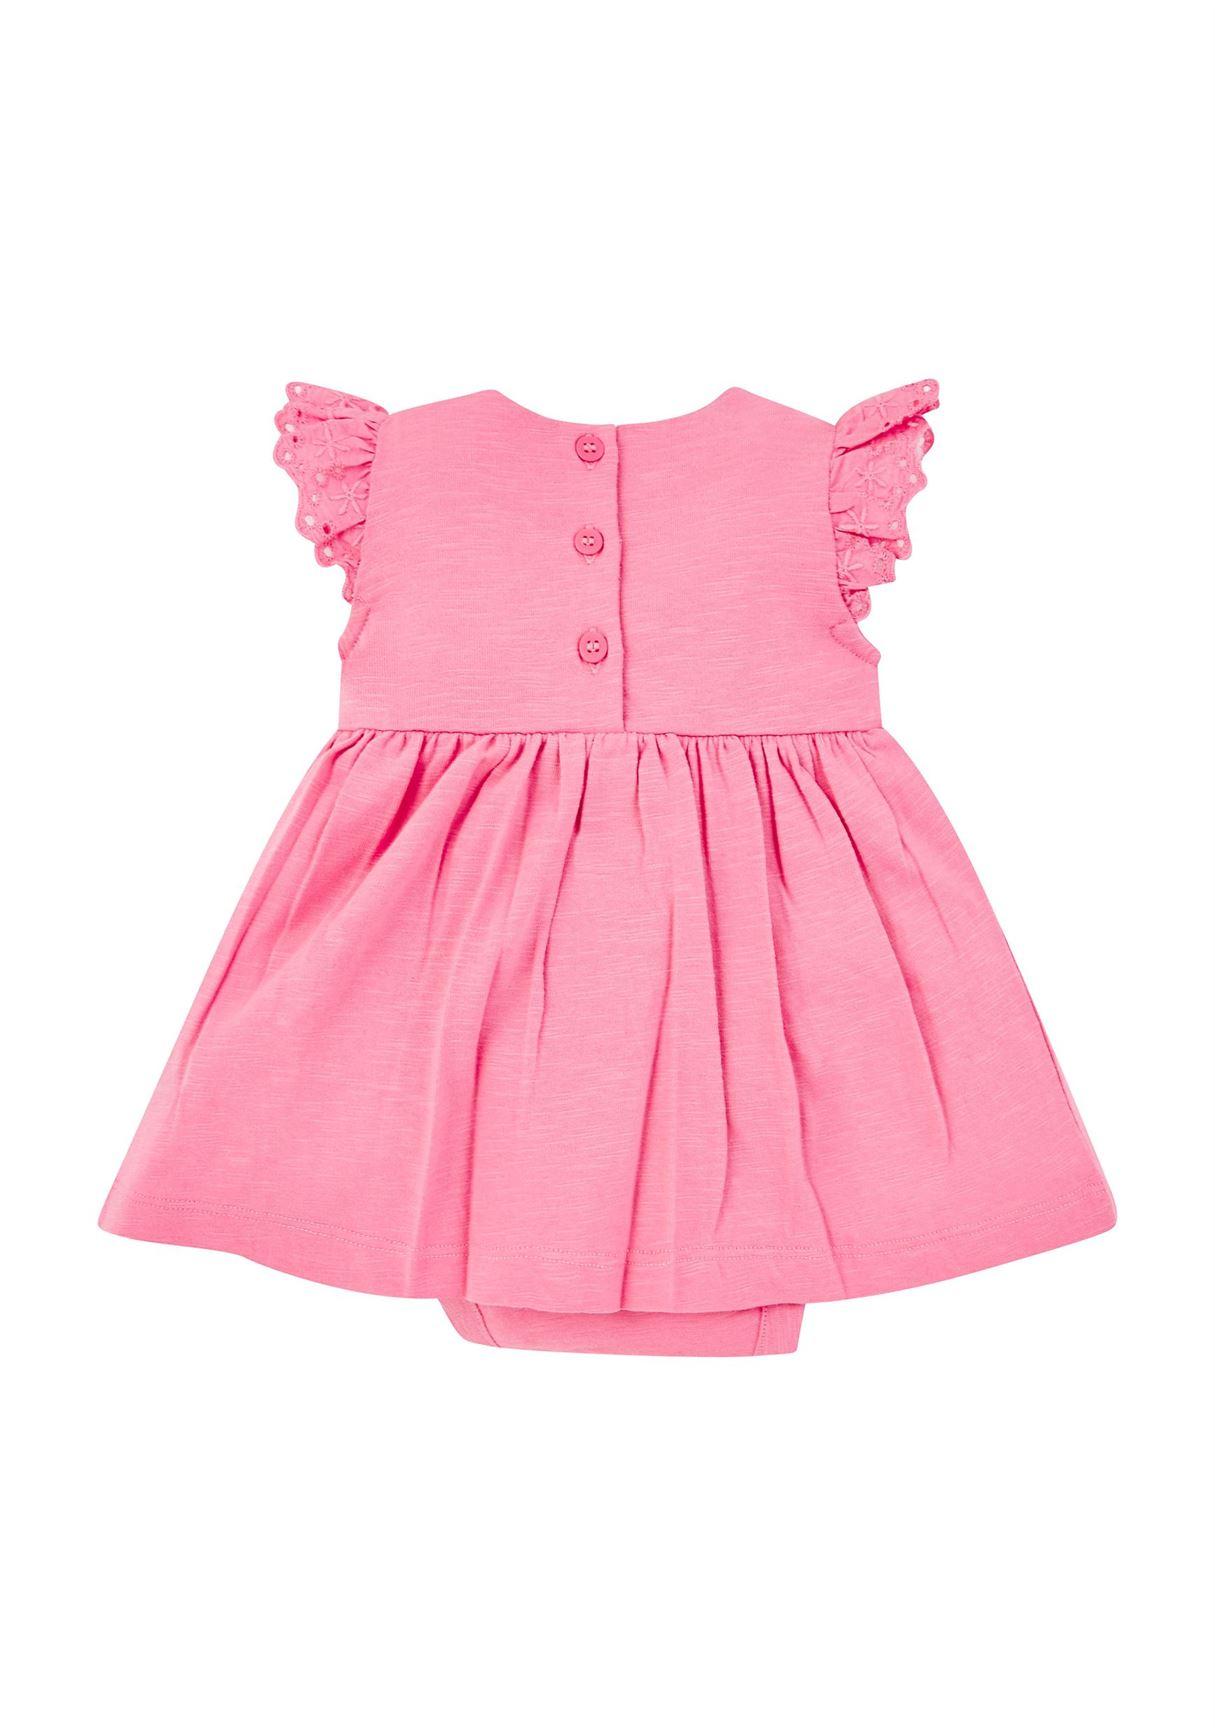 Mothercare Girls Pink Solid Dress & Panty Set